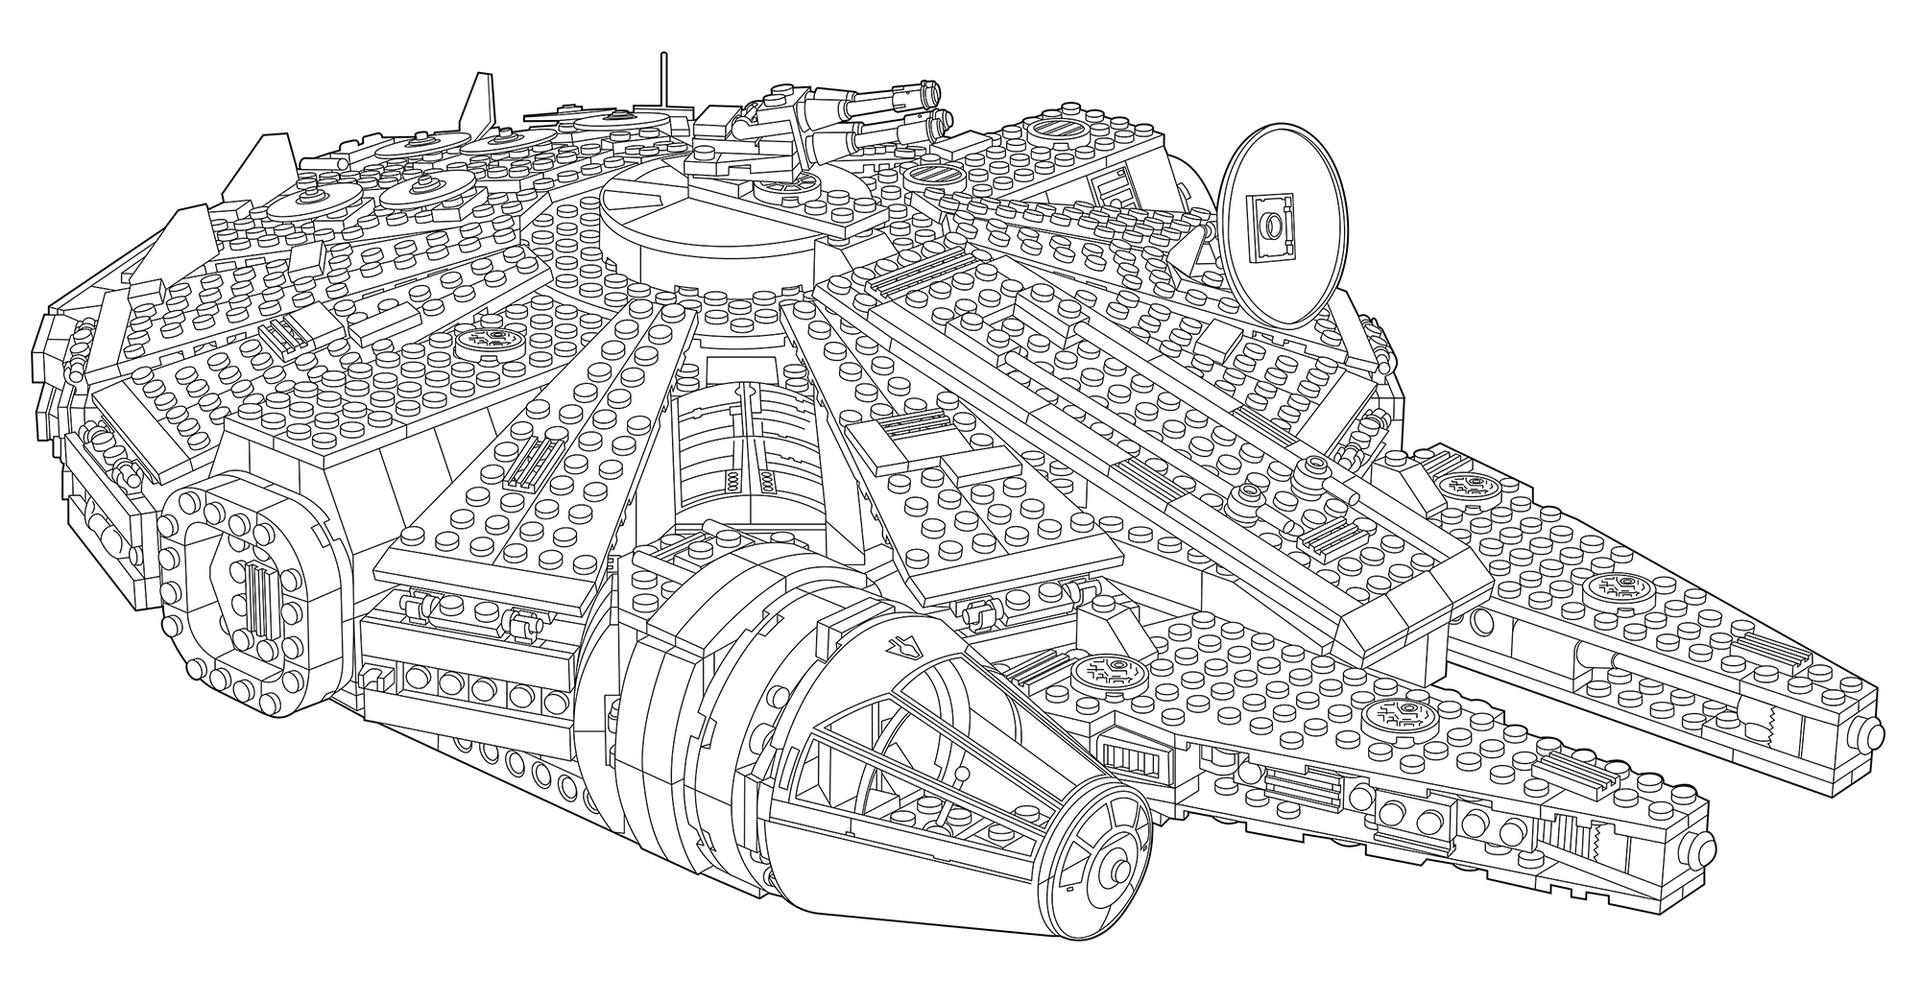 H C Tech Ill Lego Falcon 4 5 7 10 12 19